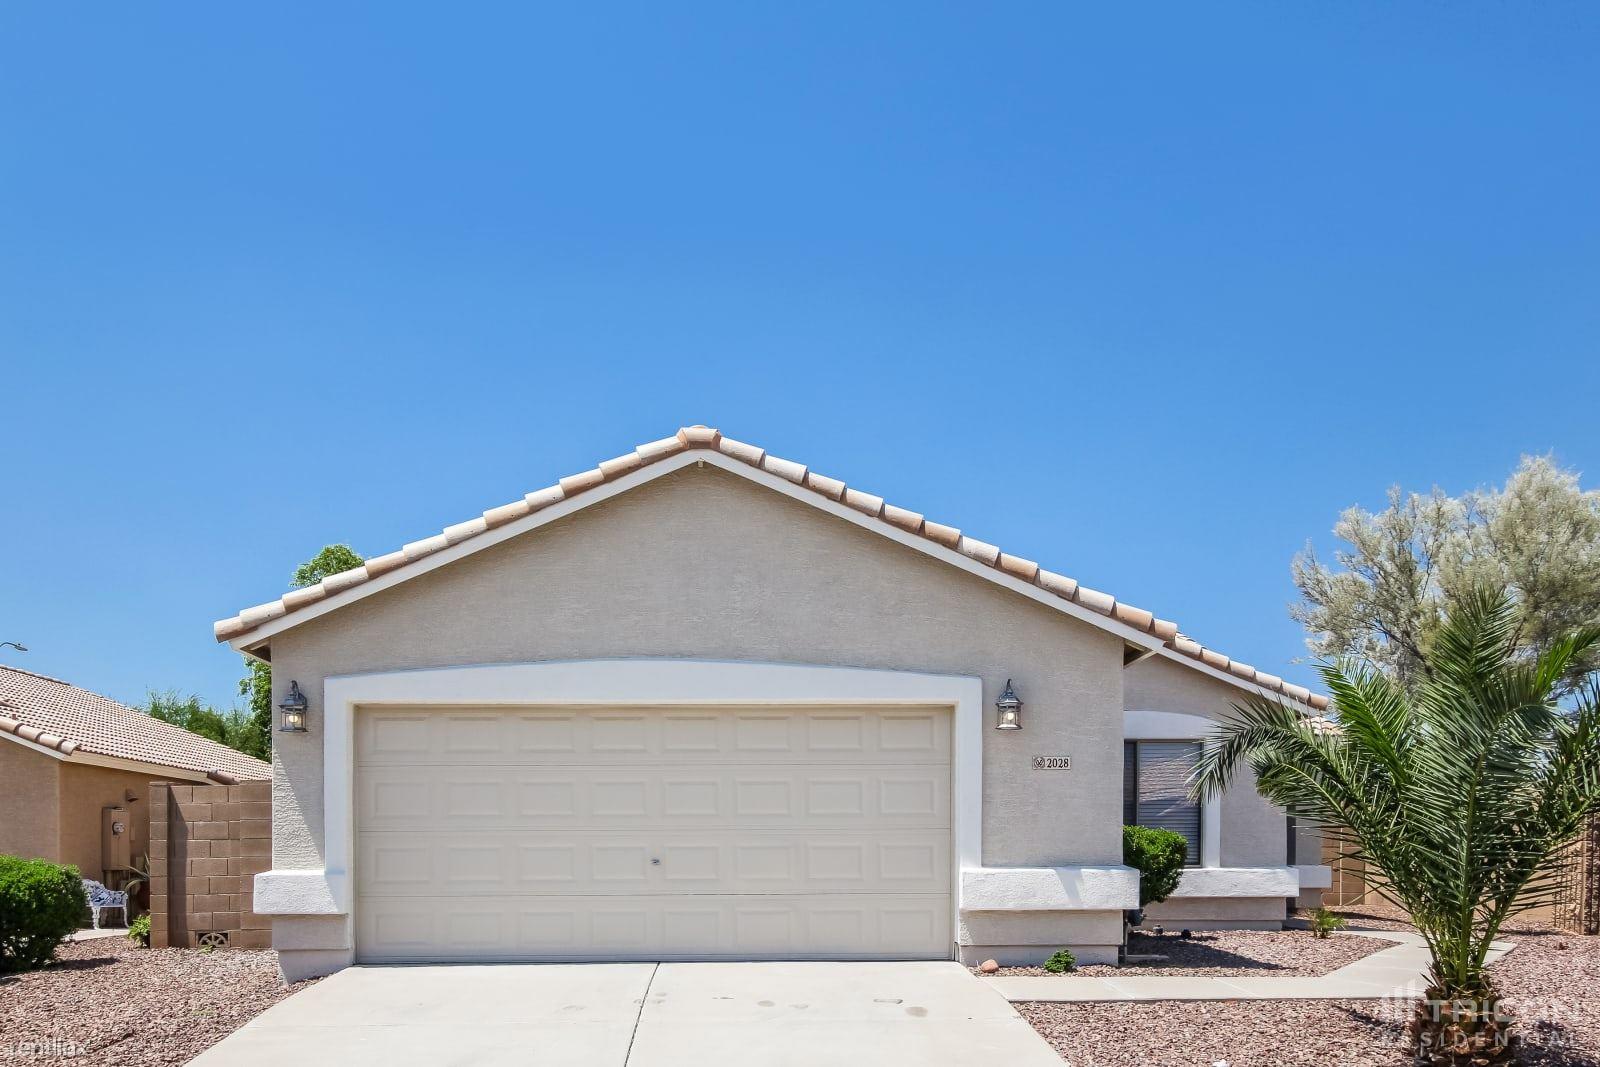 2028 S 86th Lane, Tolleson, AZ - 2,199 USD/ month